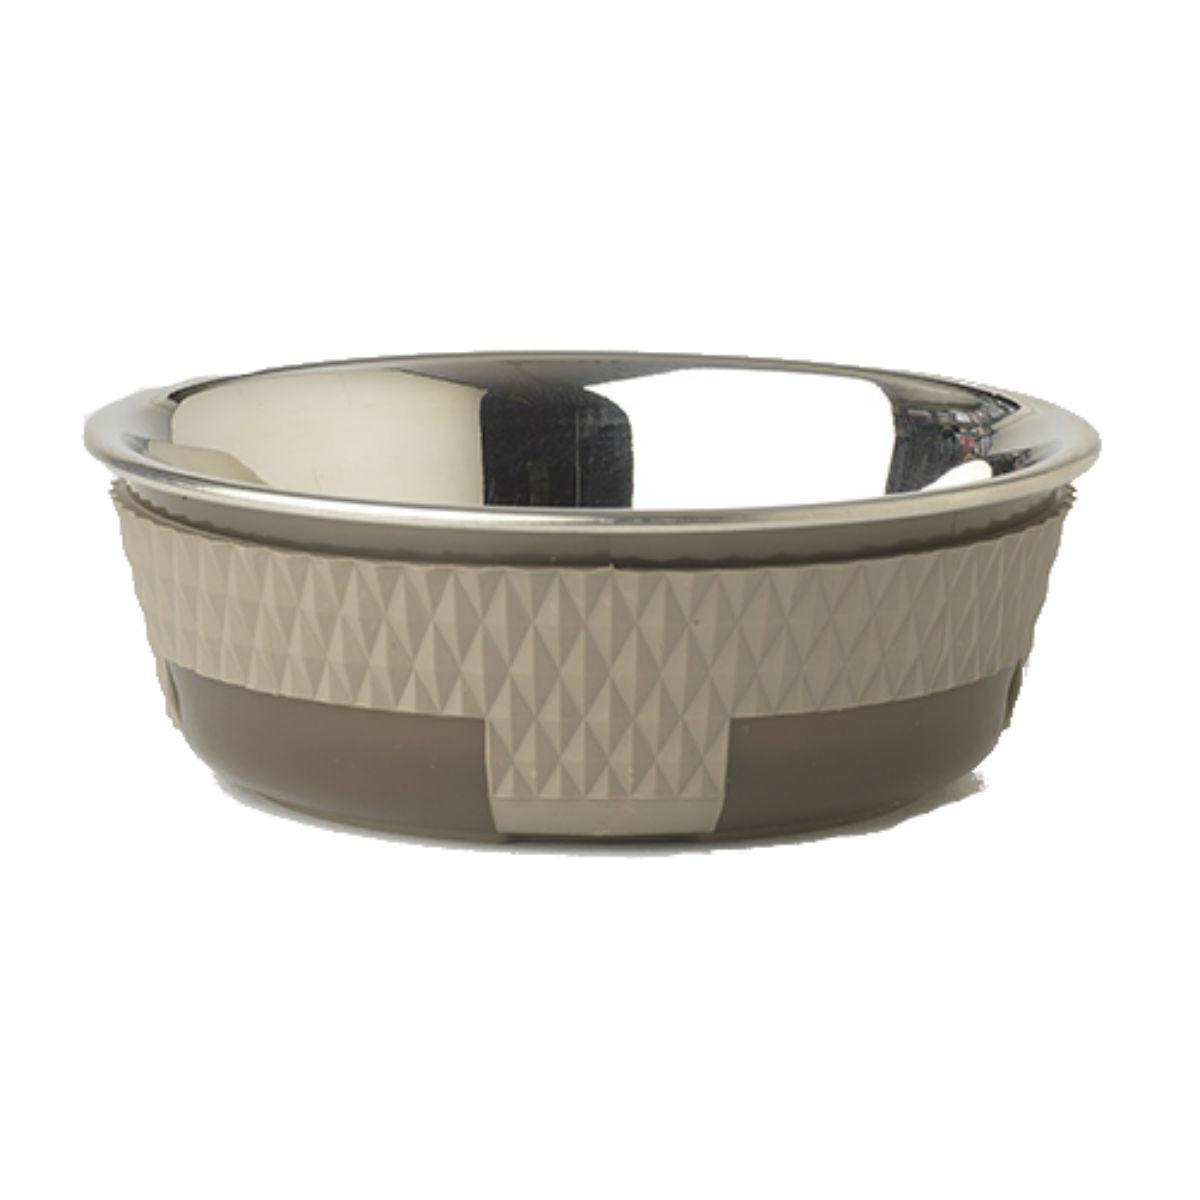 Kona Stainless Steel Dog Bowl - Taupe